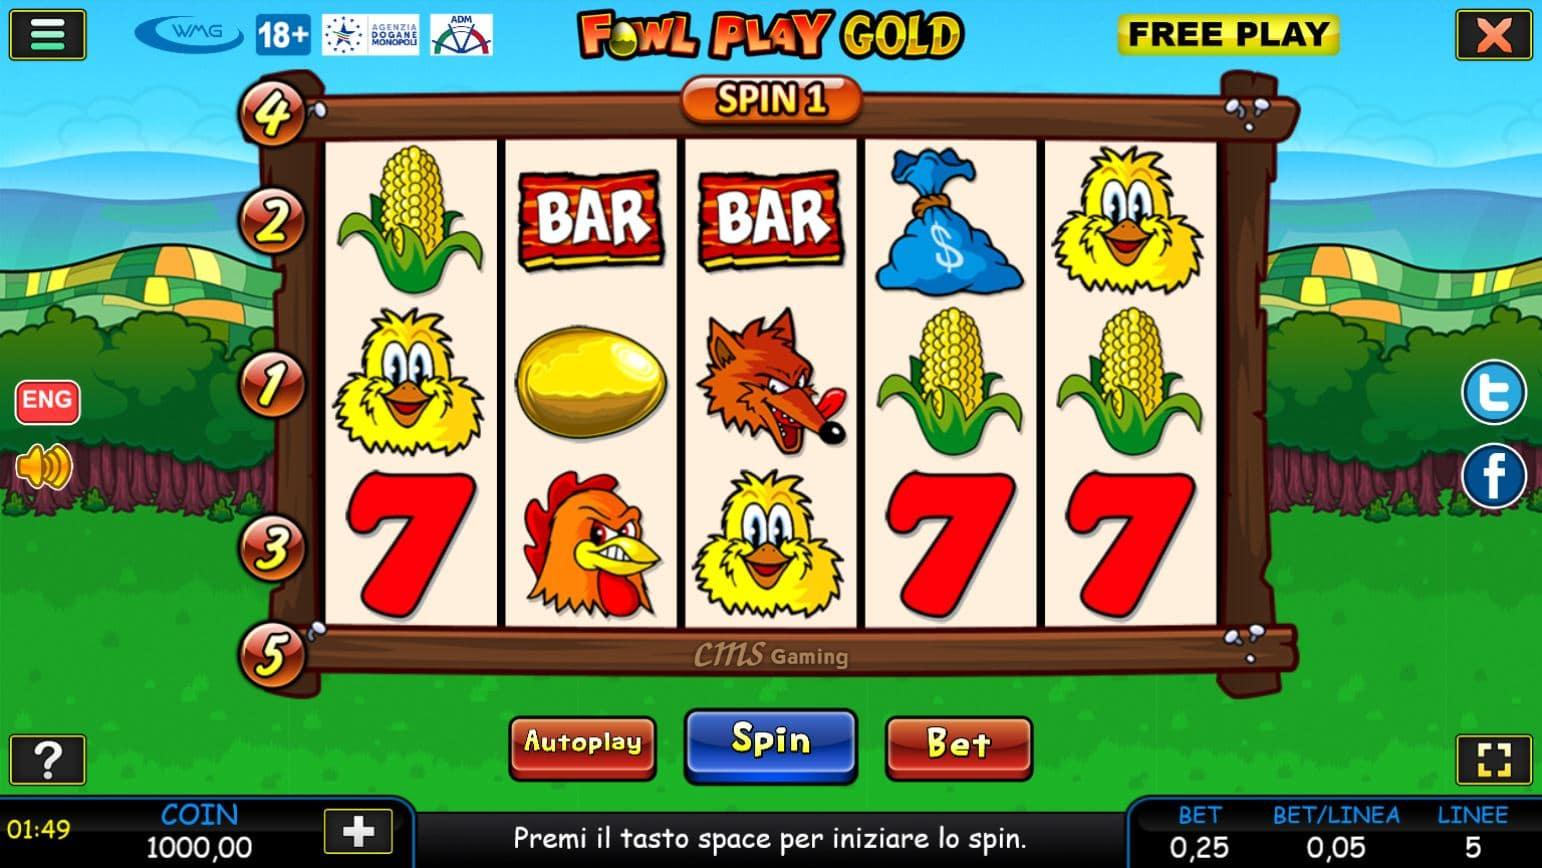 Slot Fowl Play Gold